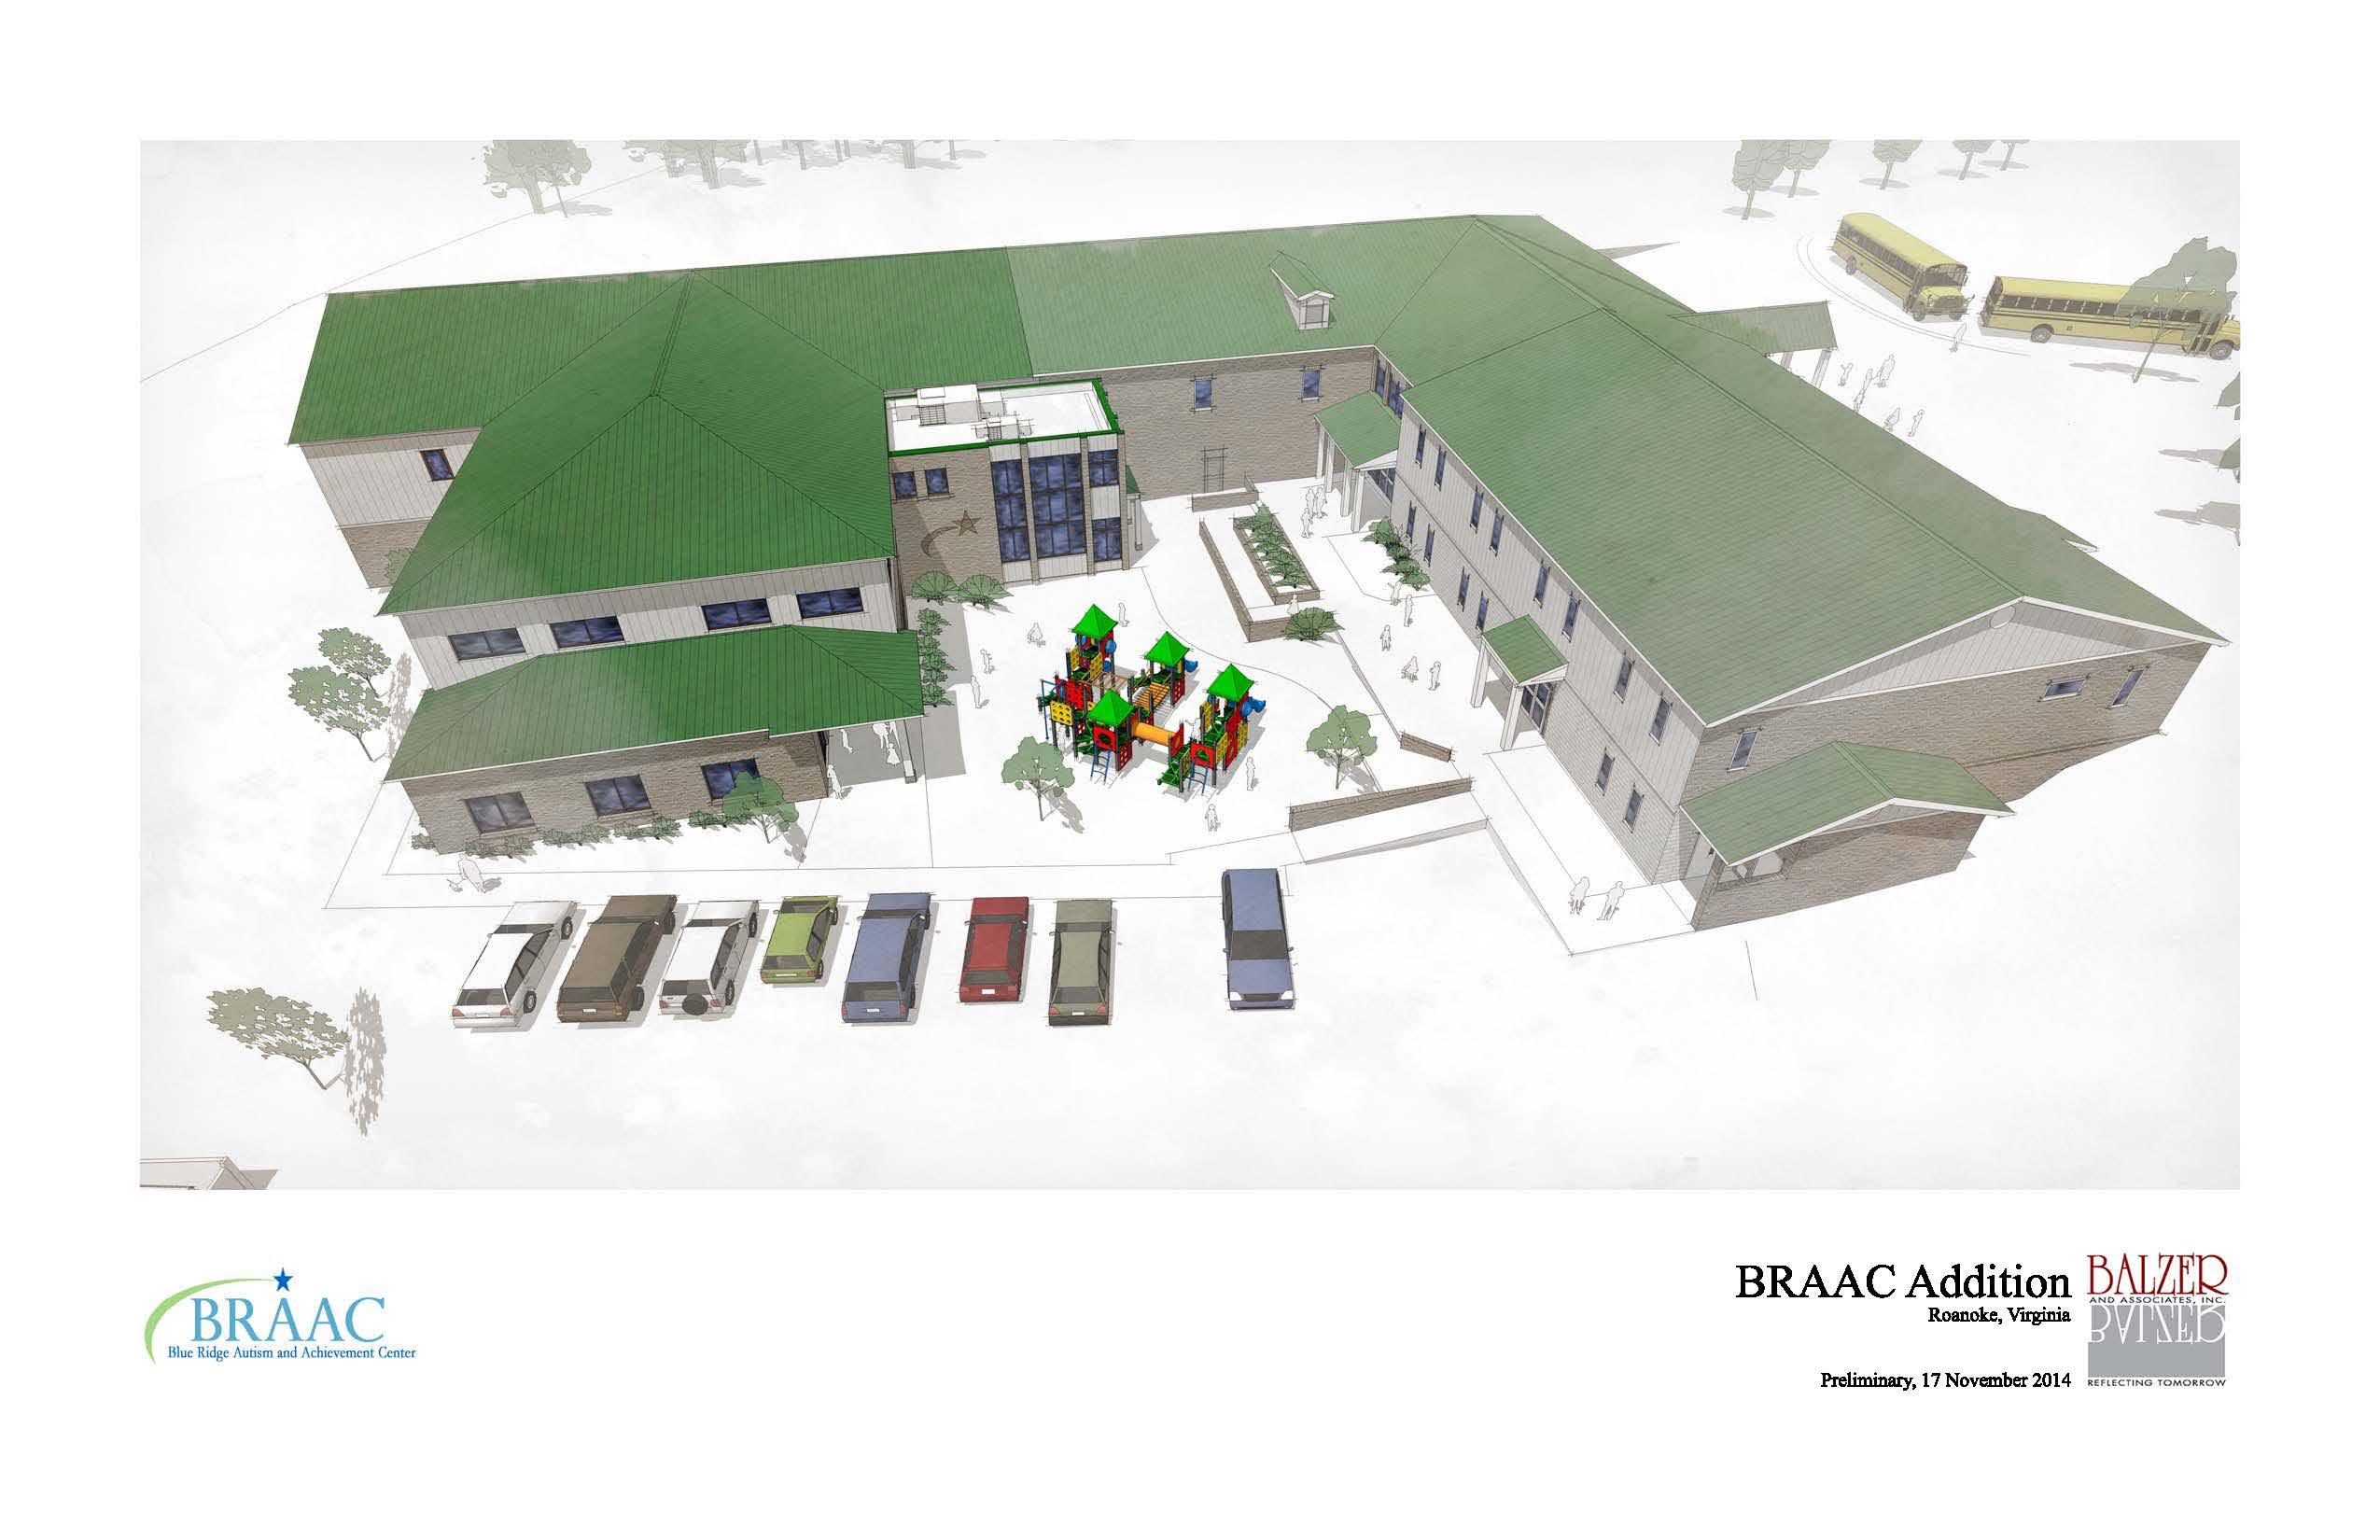 Blue Ridge Autism Achievement Centerbraac-addition_page_1